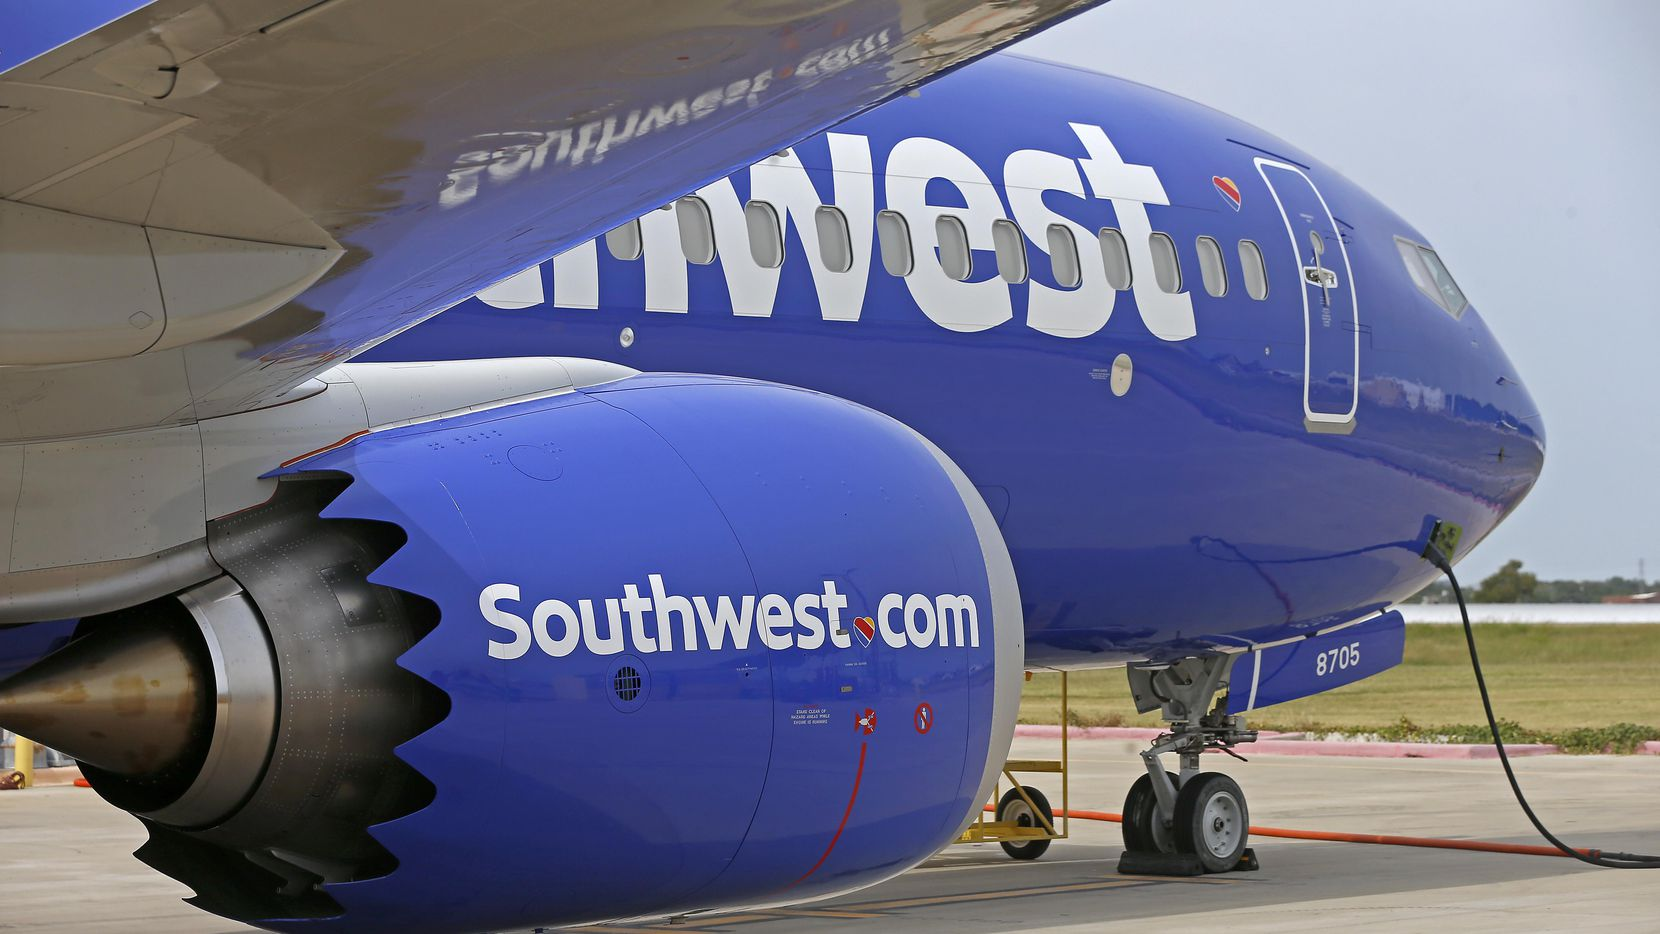 Southwest Airlines planea empezar vuelos a Hawaii